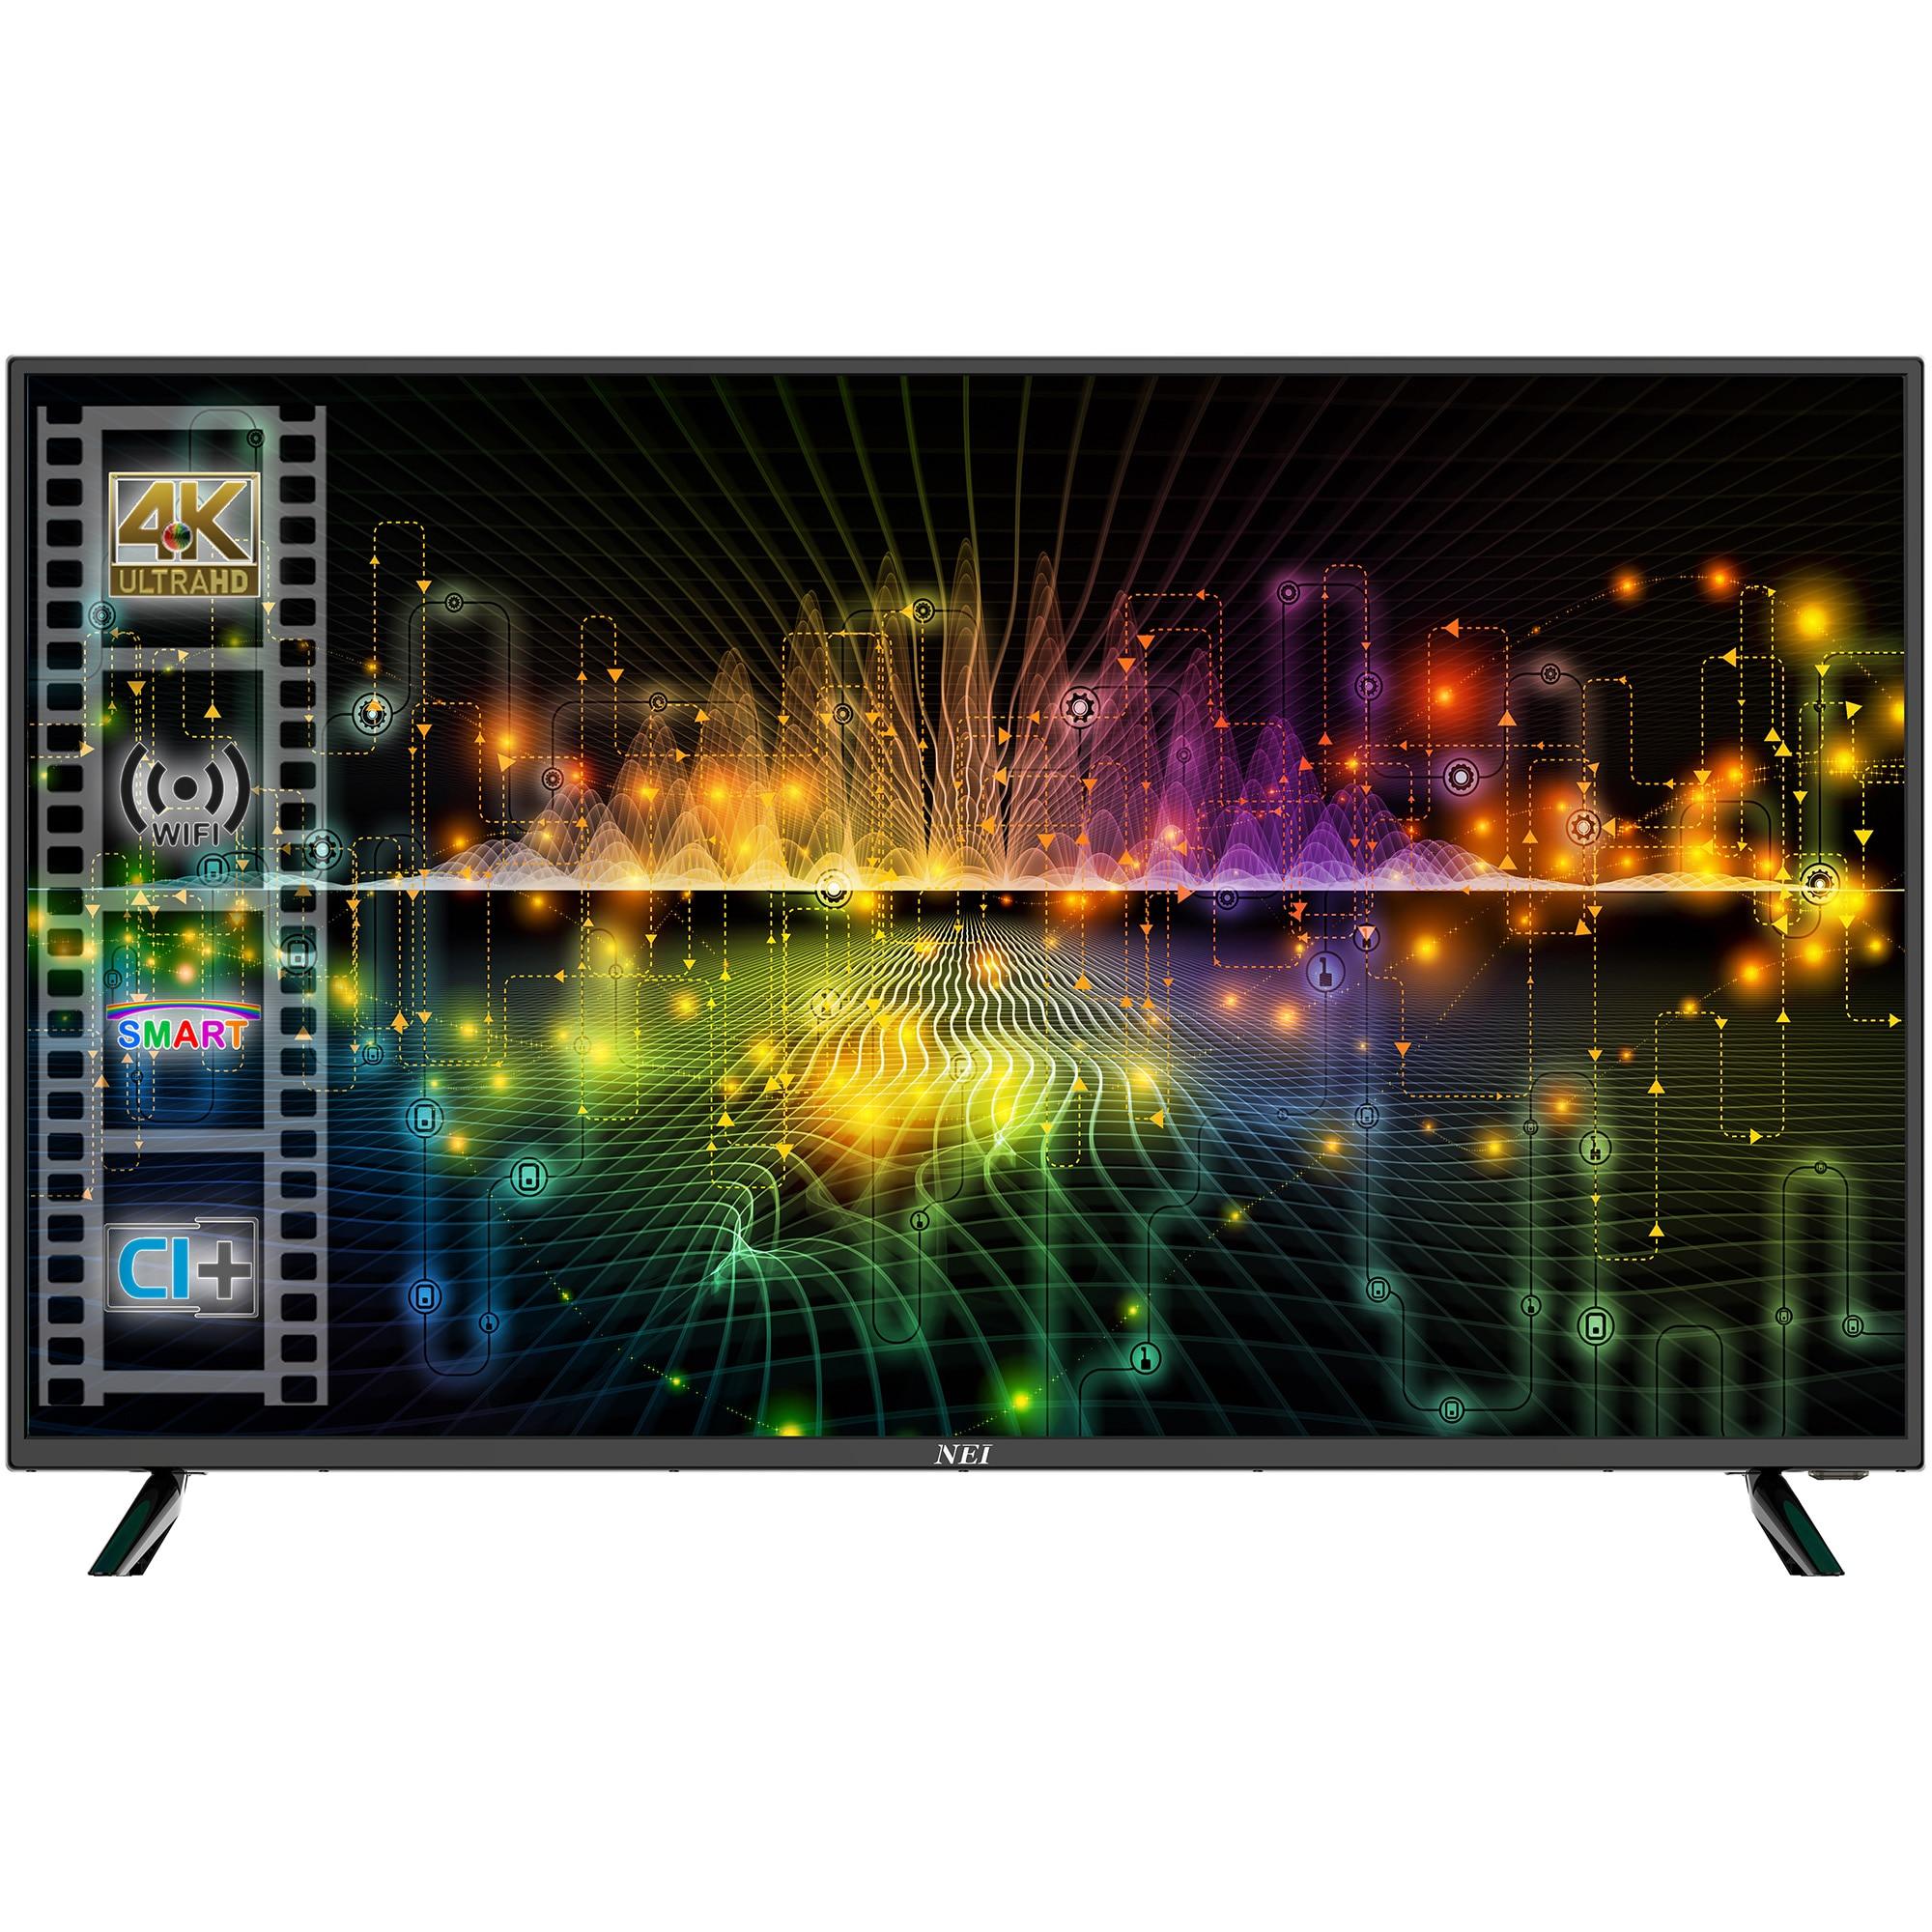 Fotografie Televizor Nei 50NE6700, 126cm, Smart, 4K Ultra HD, LED, Clasa G